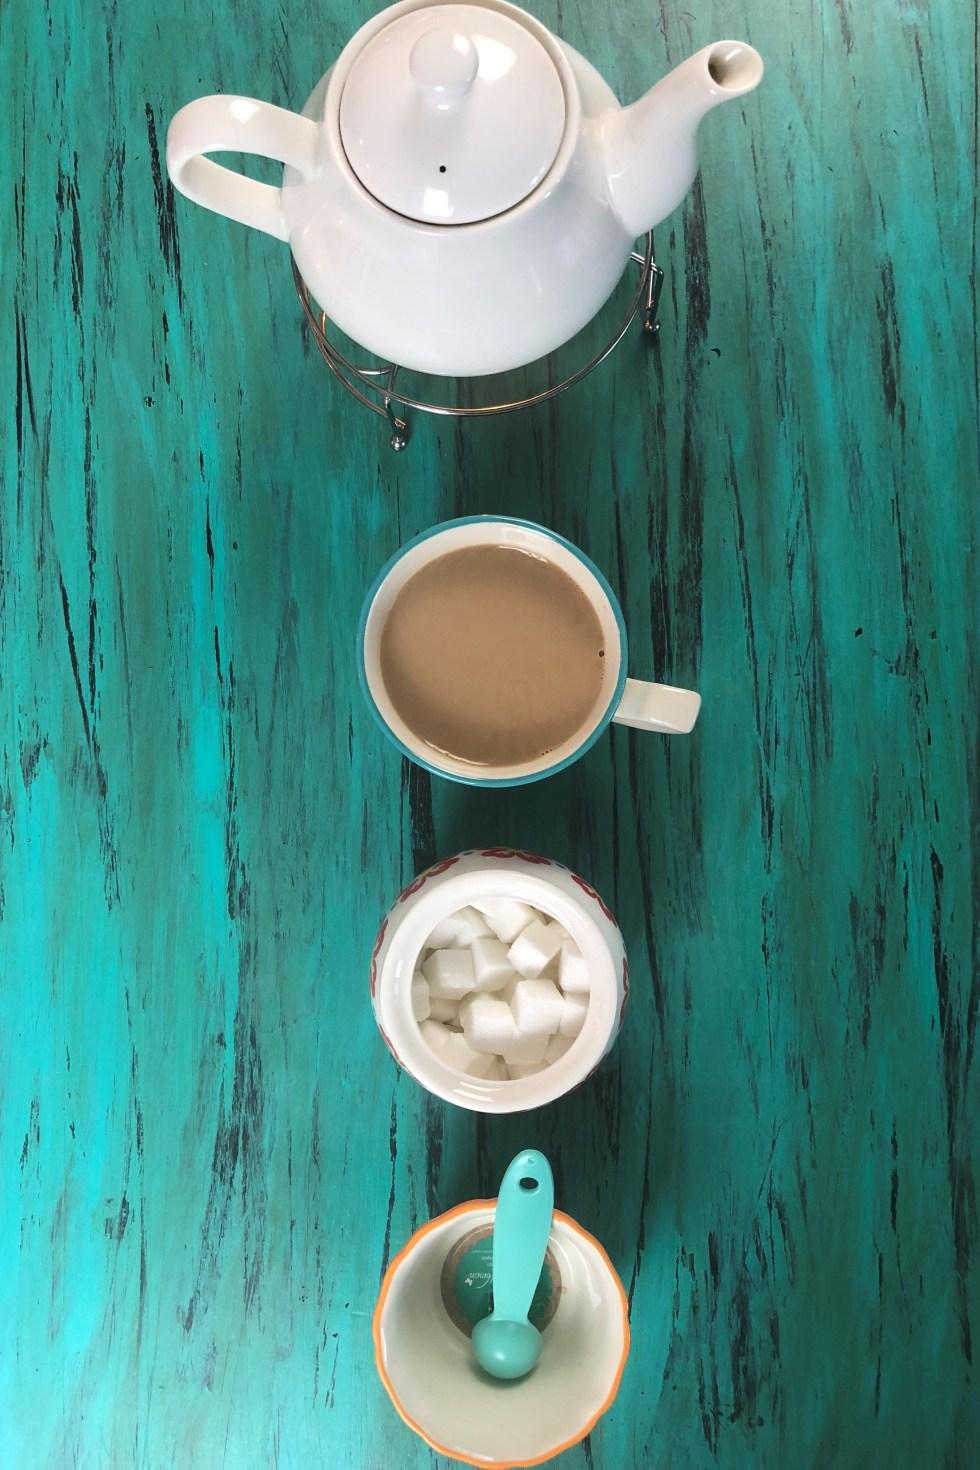 Ingredients needed to make sheer chai afghan (Cardamom Tea with milk)